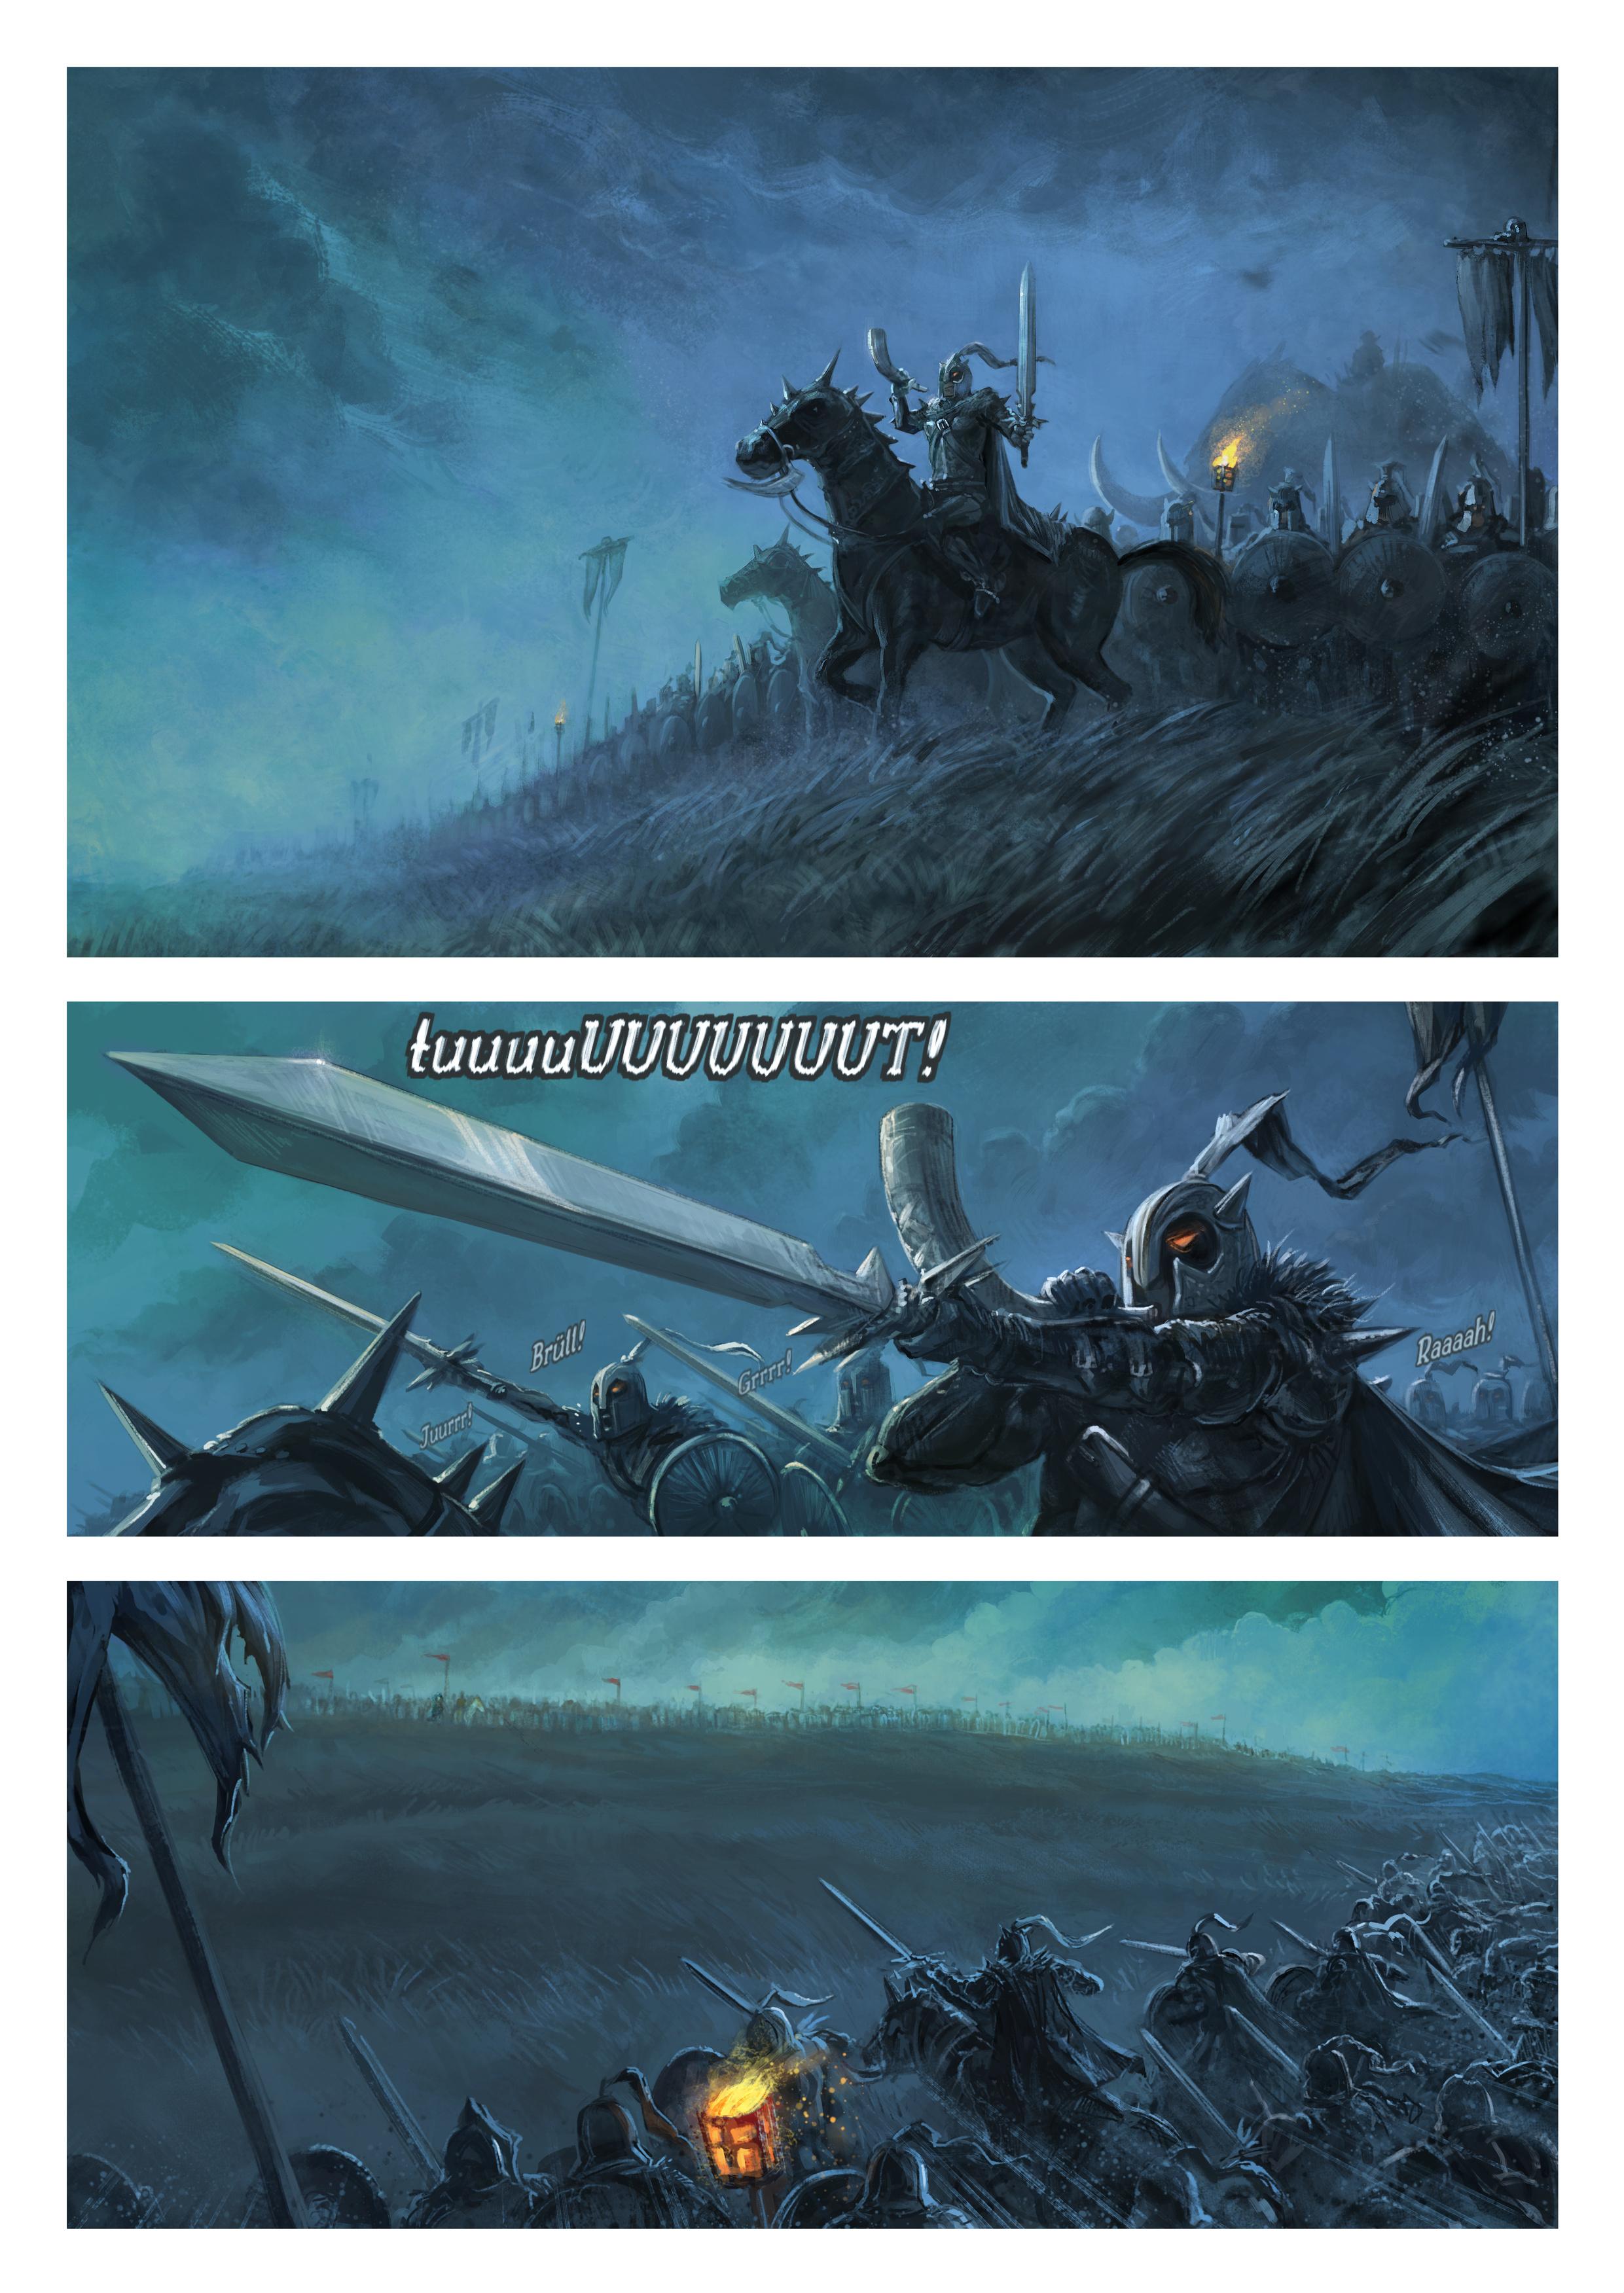 Episode 33: Zauberhafter Krieg, Page 1